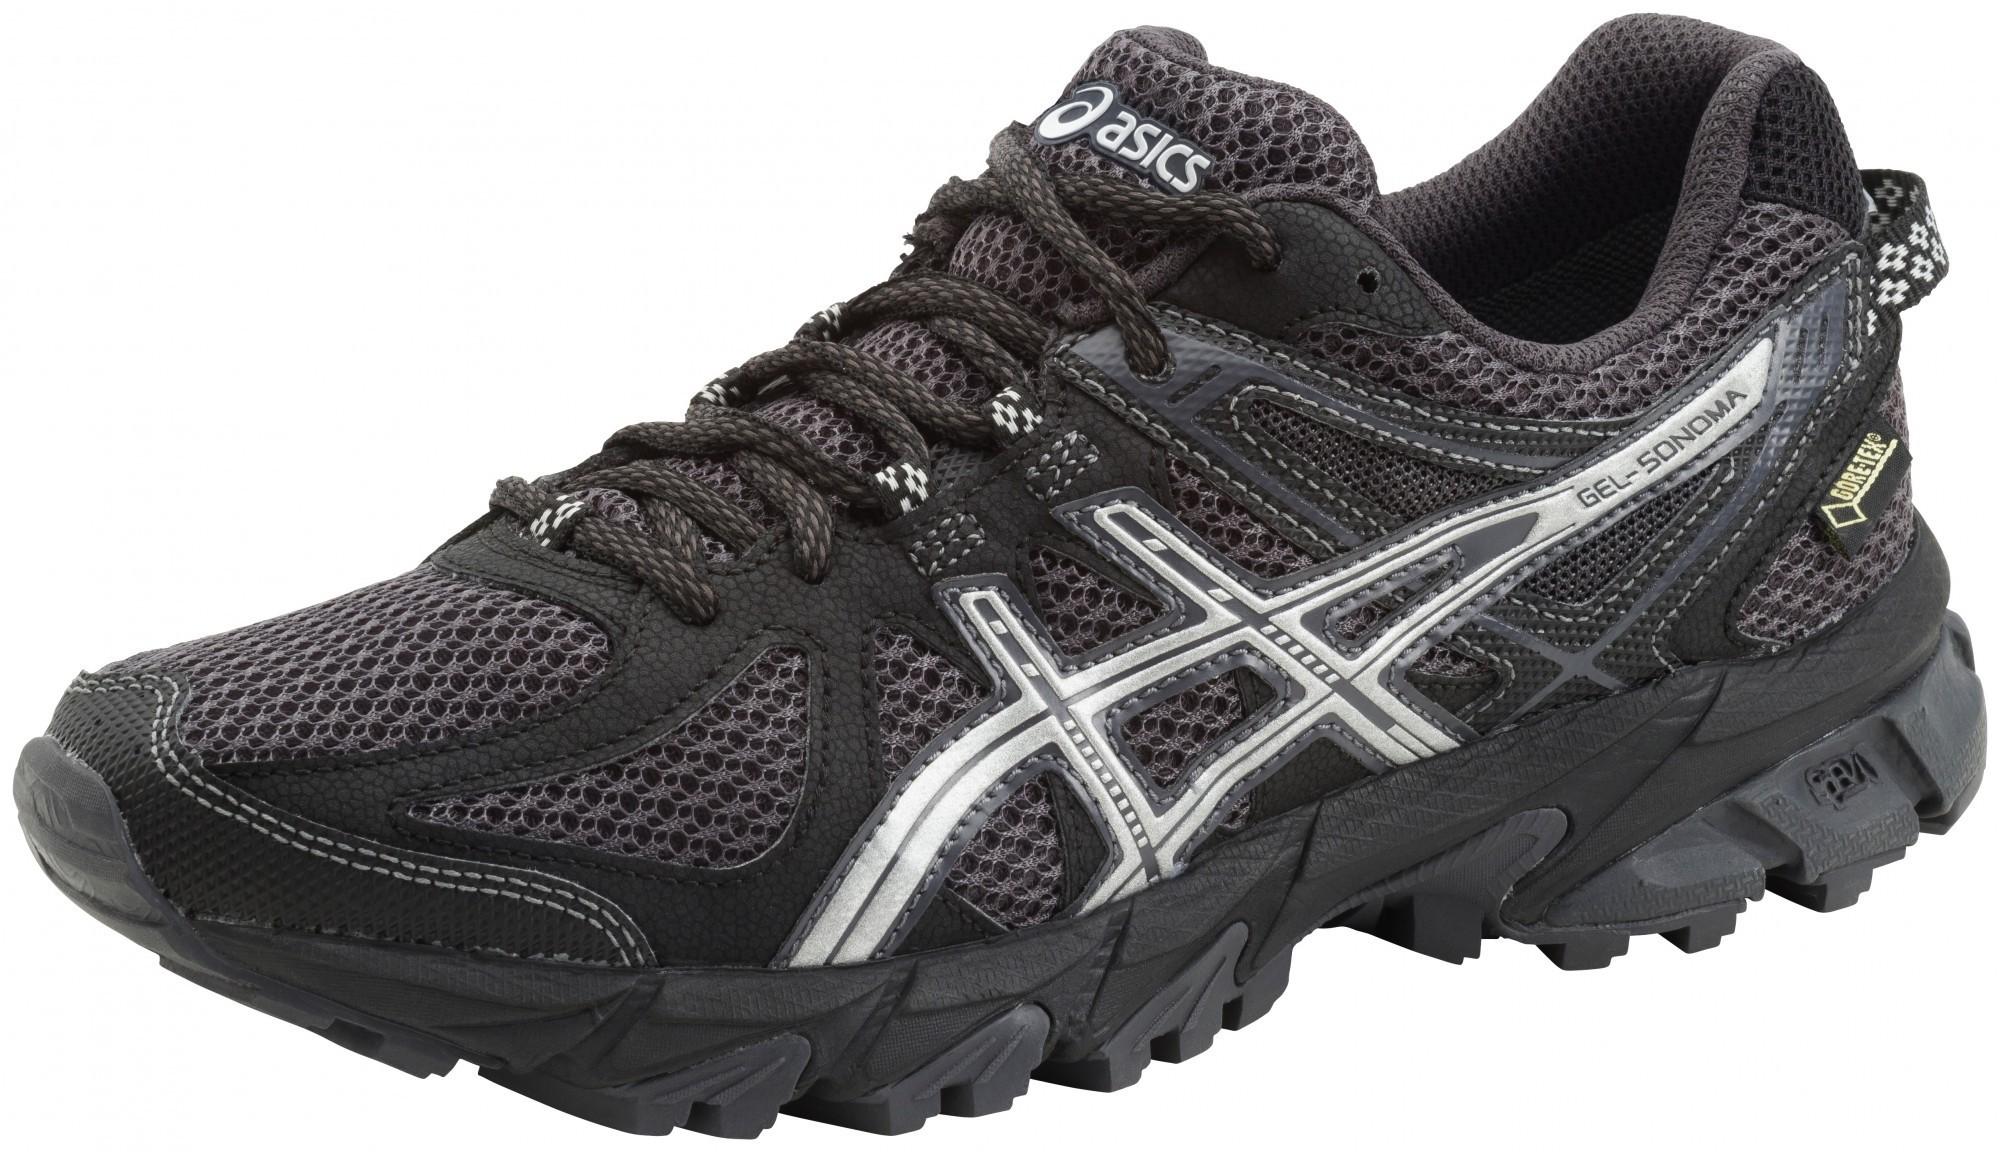 Details about Asics Gel-Sonoma 2 GTX Ladies Trail Running Shoes Waterproof  Sportsc